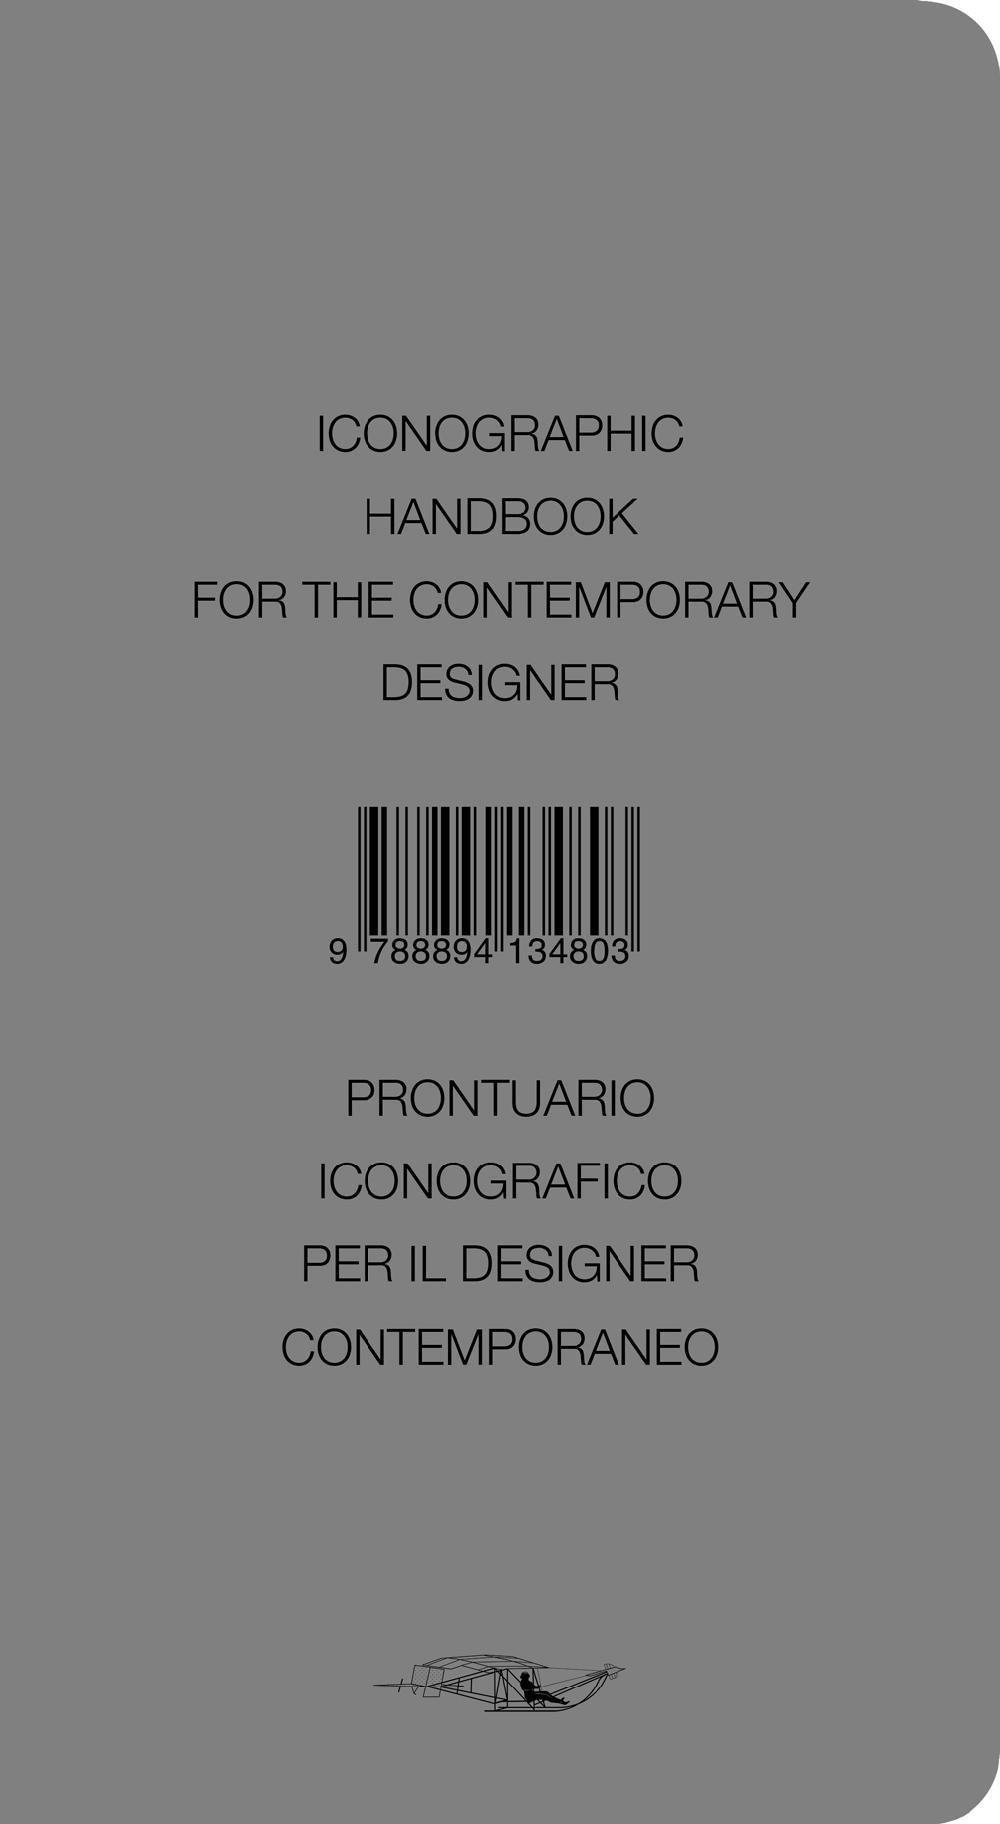 Iconographic Handbook for the Contemporary Designer - Prontuario iconografico per il designer contemporaneo